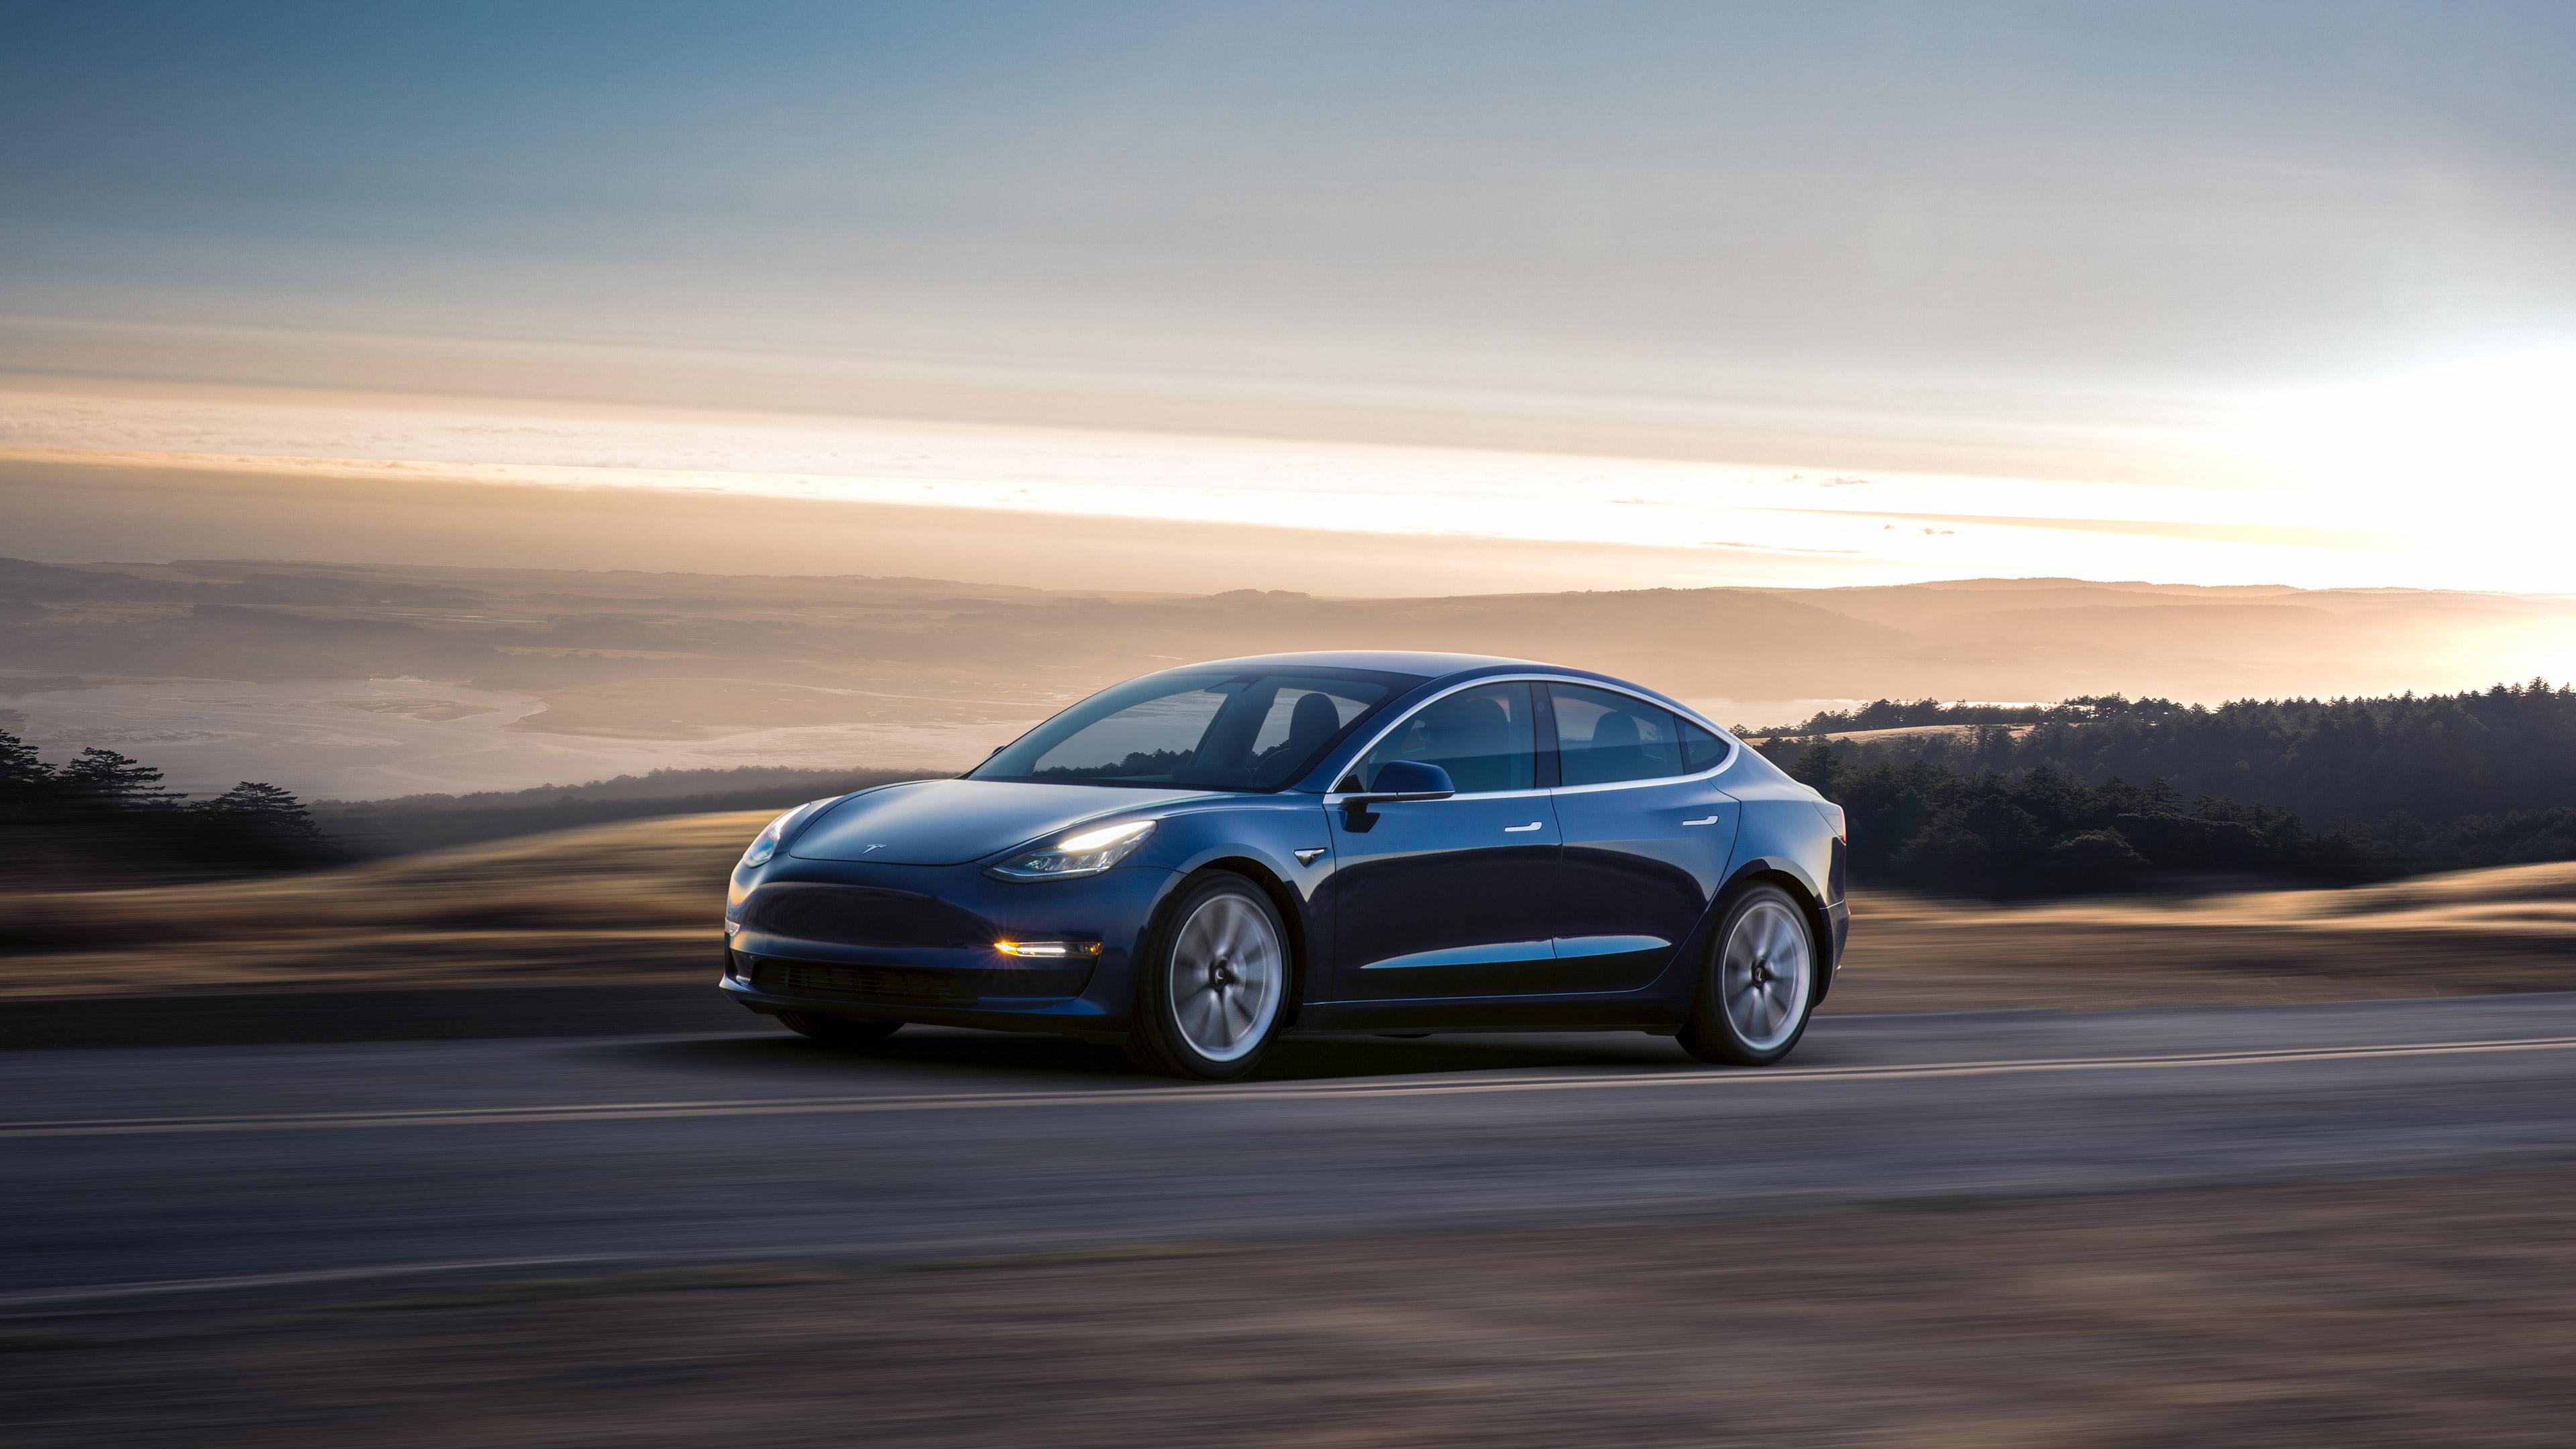 2017 tesla model 3 1539106033 - 2017 Tesla Model 3 - tesla wallpapers, tesla model 3 wallpapers, hd-wallpapers, cars wallpapers, 4k-wallpapers, 2017 cars wallpapers